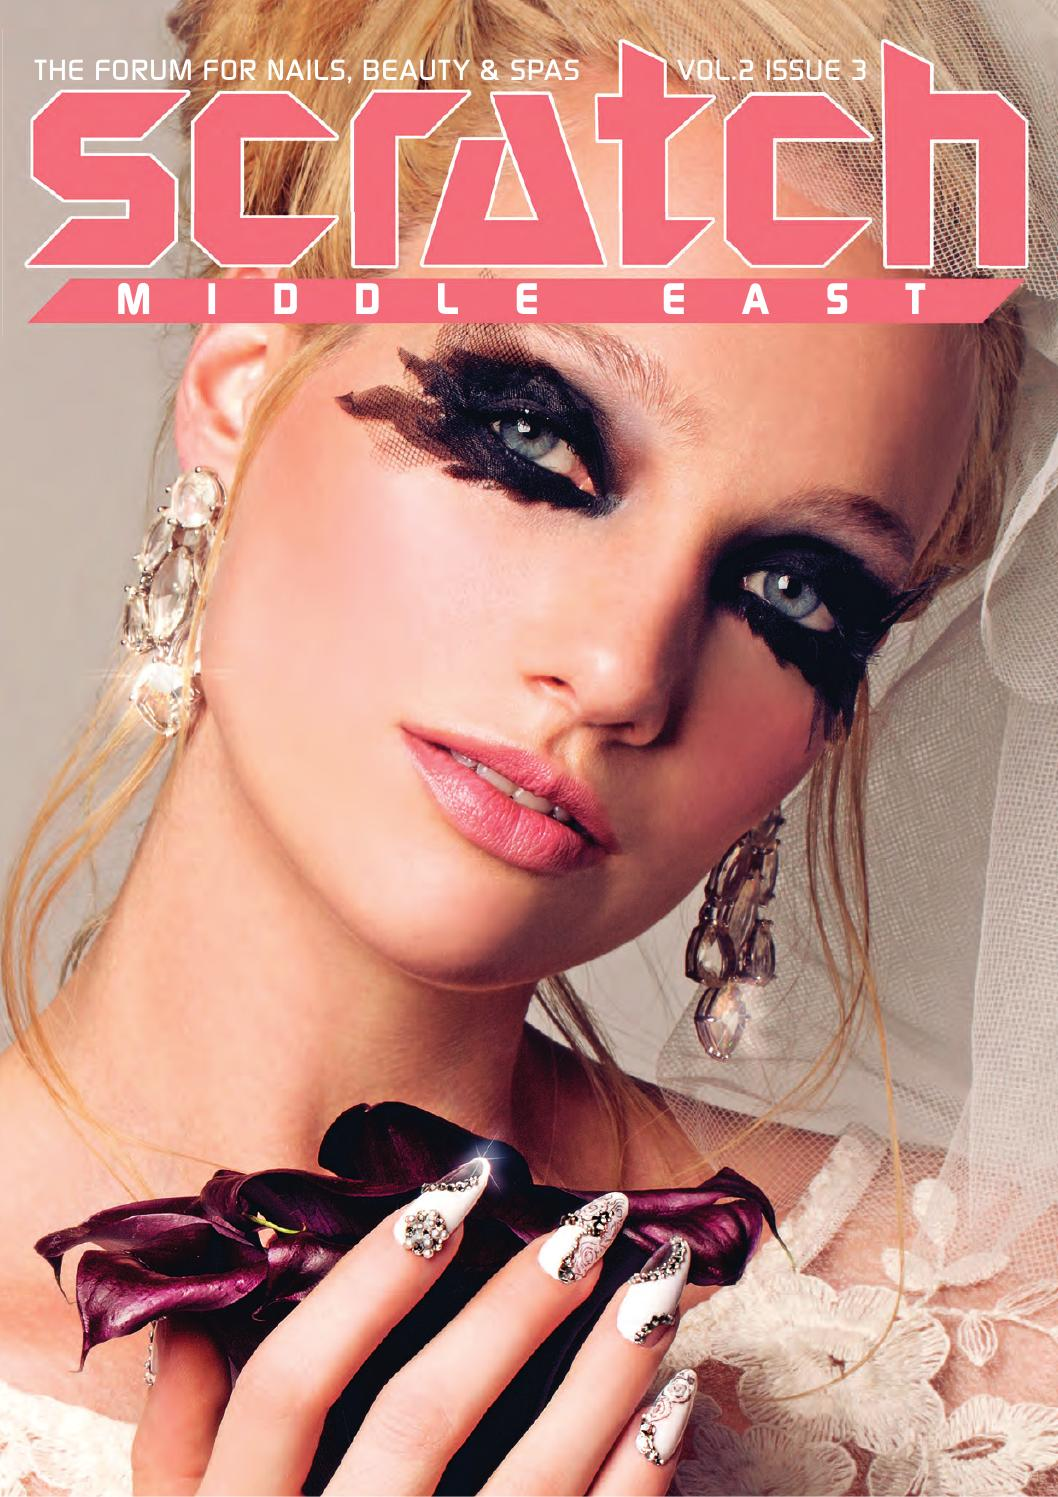 9f3bb6ccf Scratch Middle East, vol2 issue3 by tlc design studio - issuu